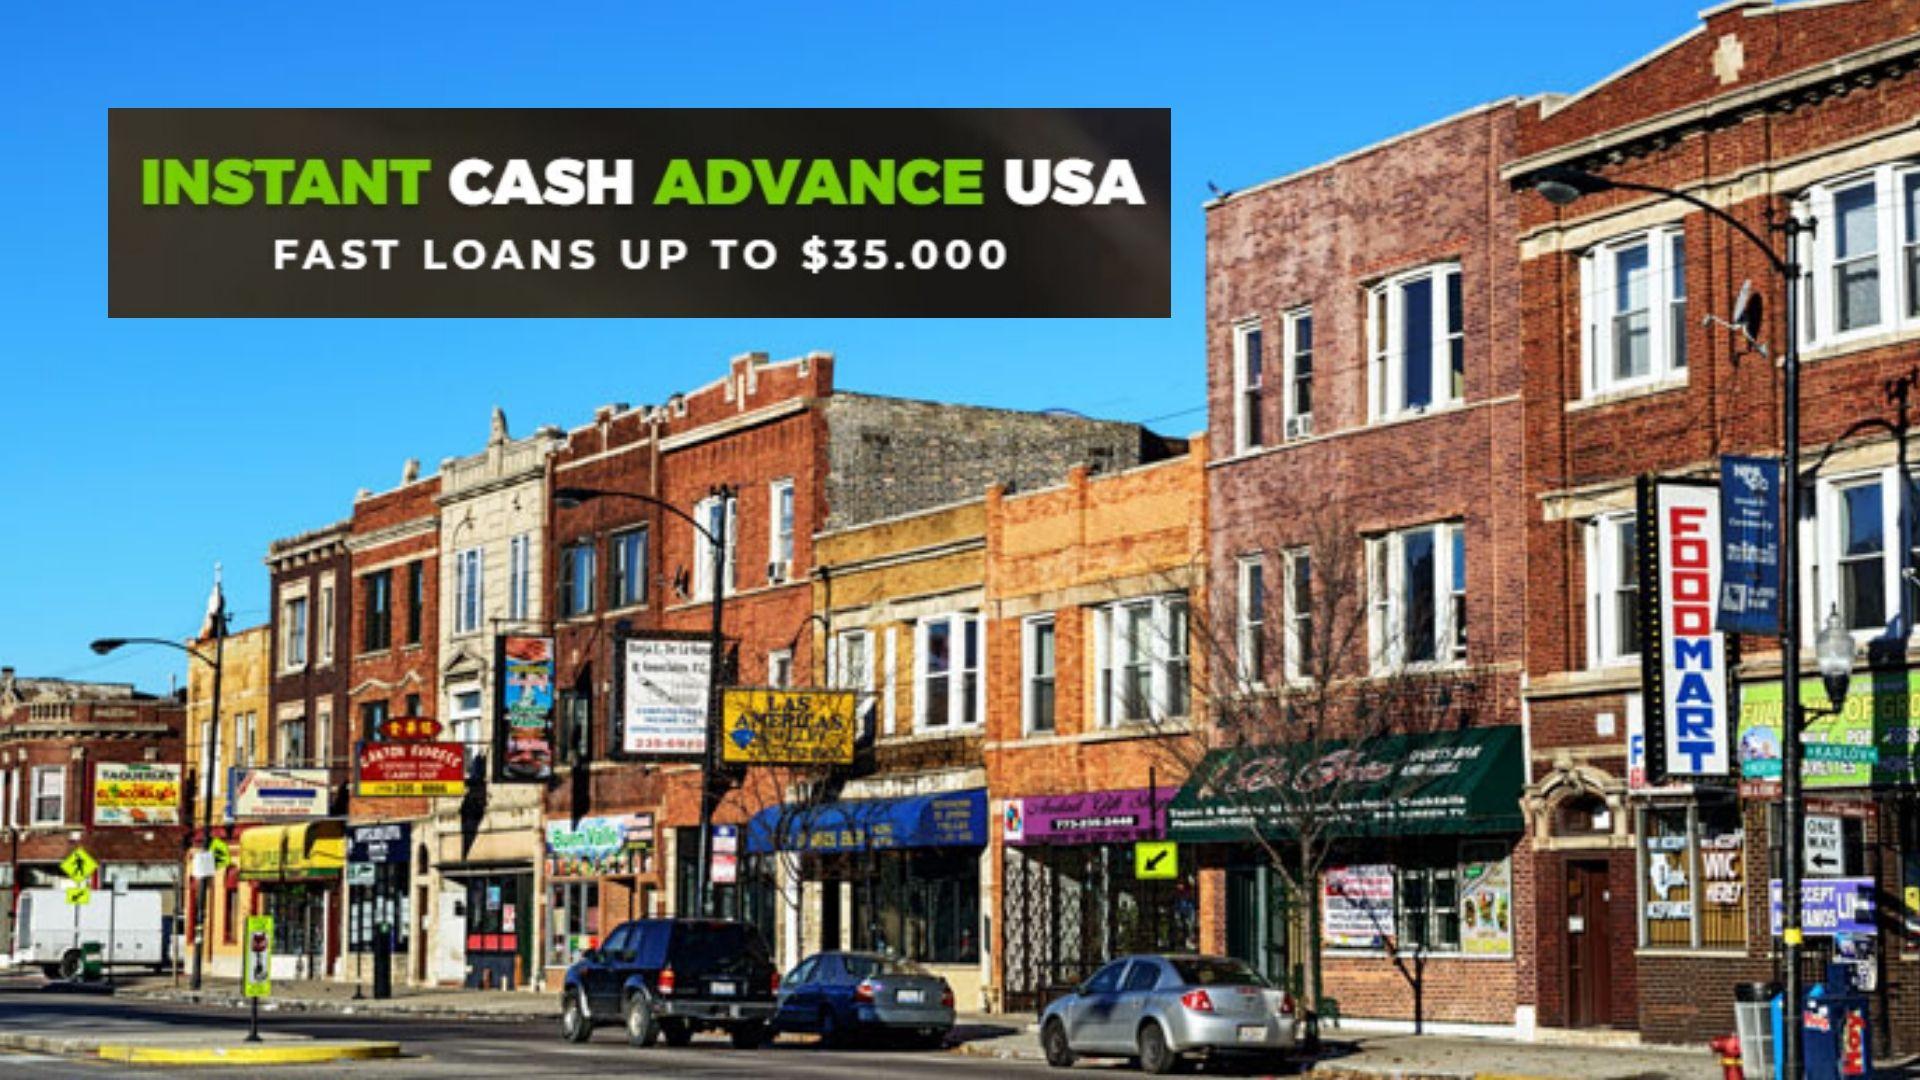 Illinois cash advance